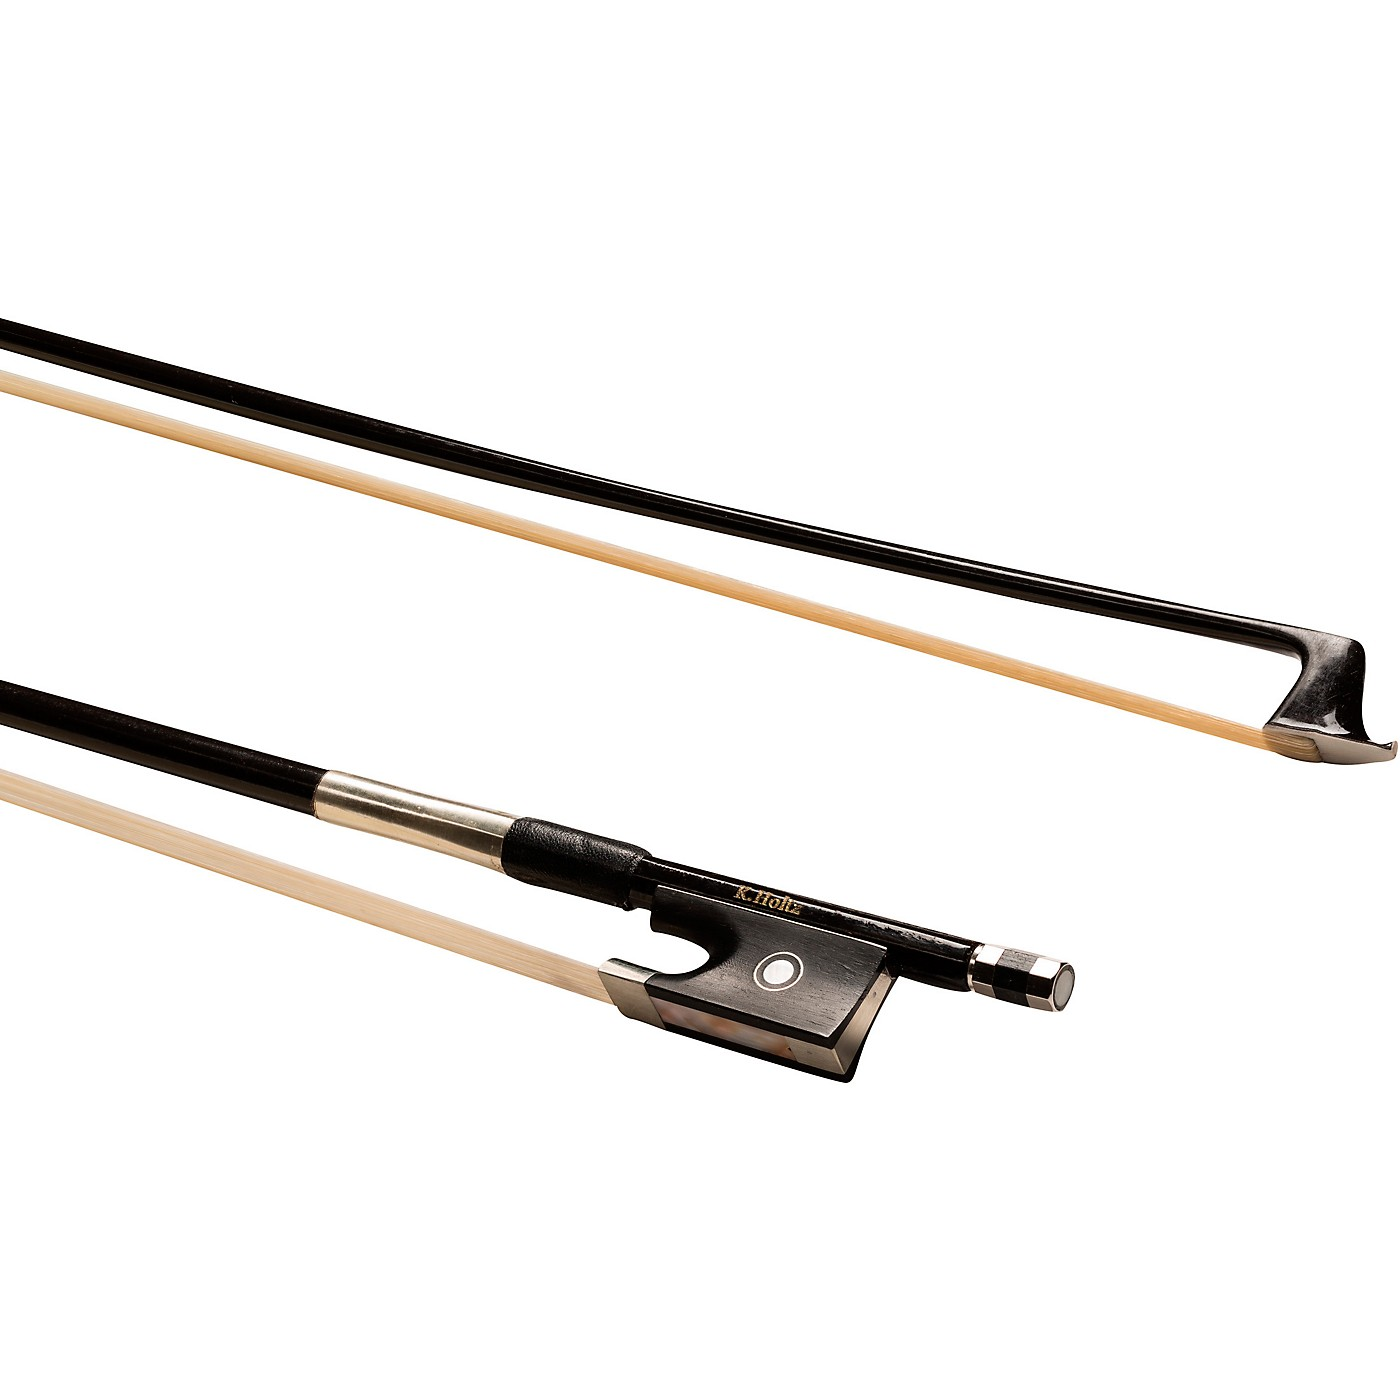 K Holtz BL10 FG Series Fiberglass Violin Bow thumbnail